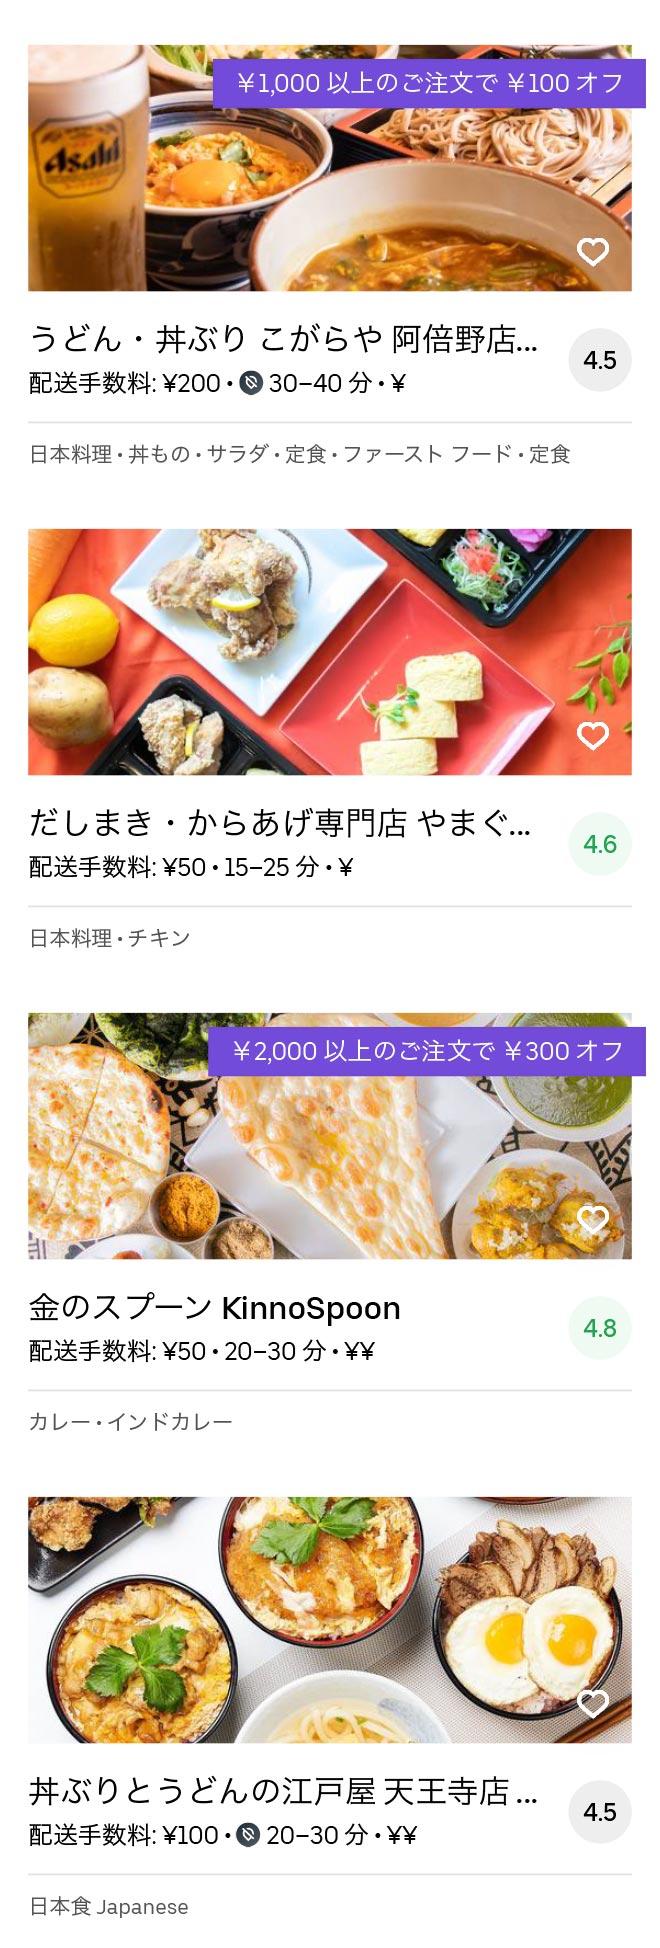 Osaka harinakano menu 2005 10